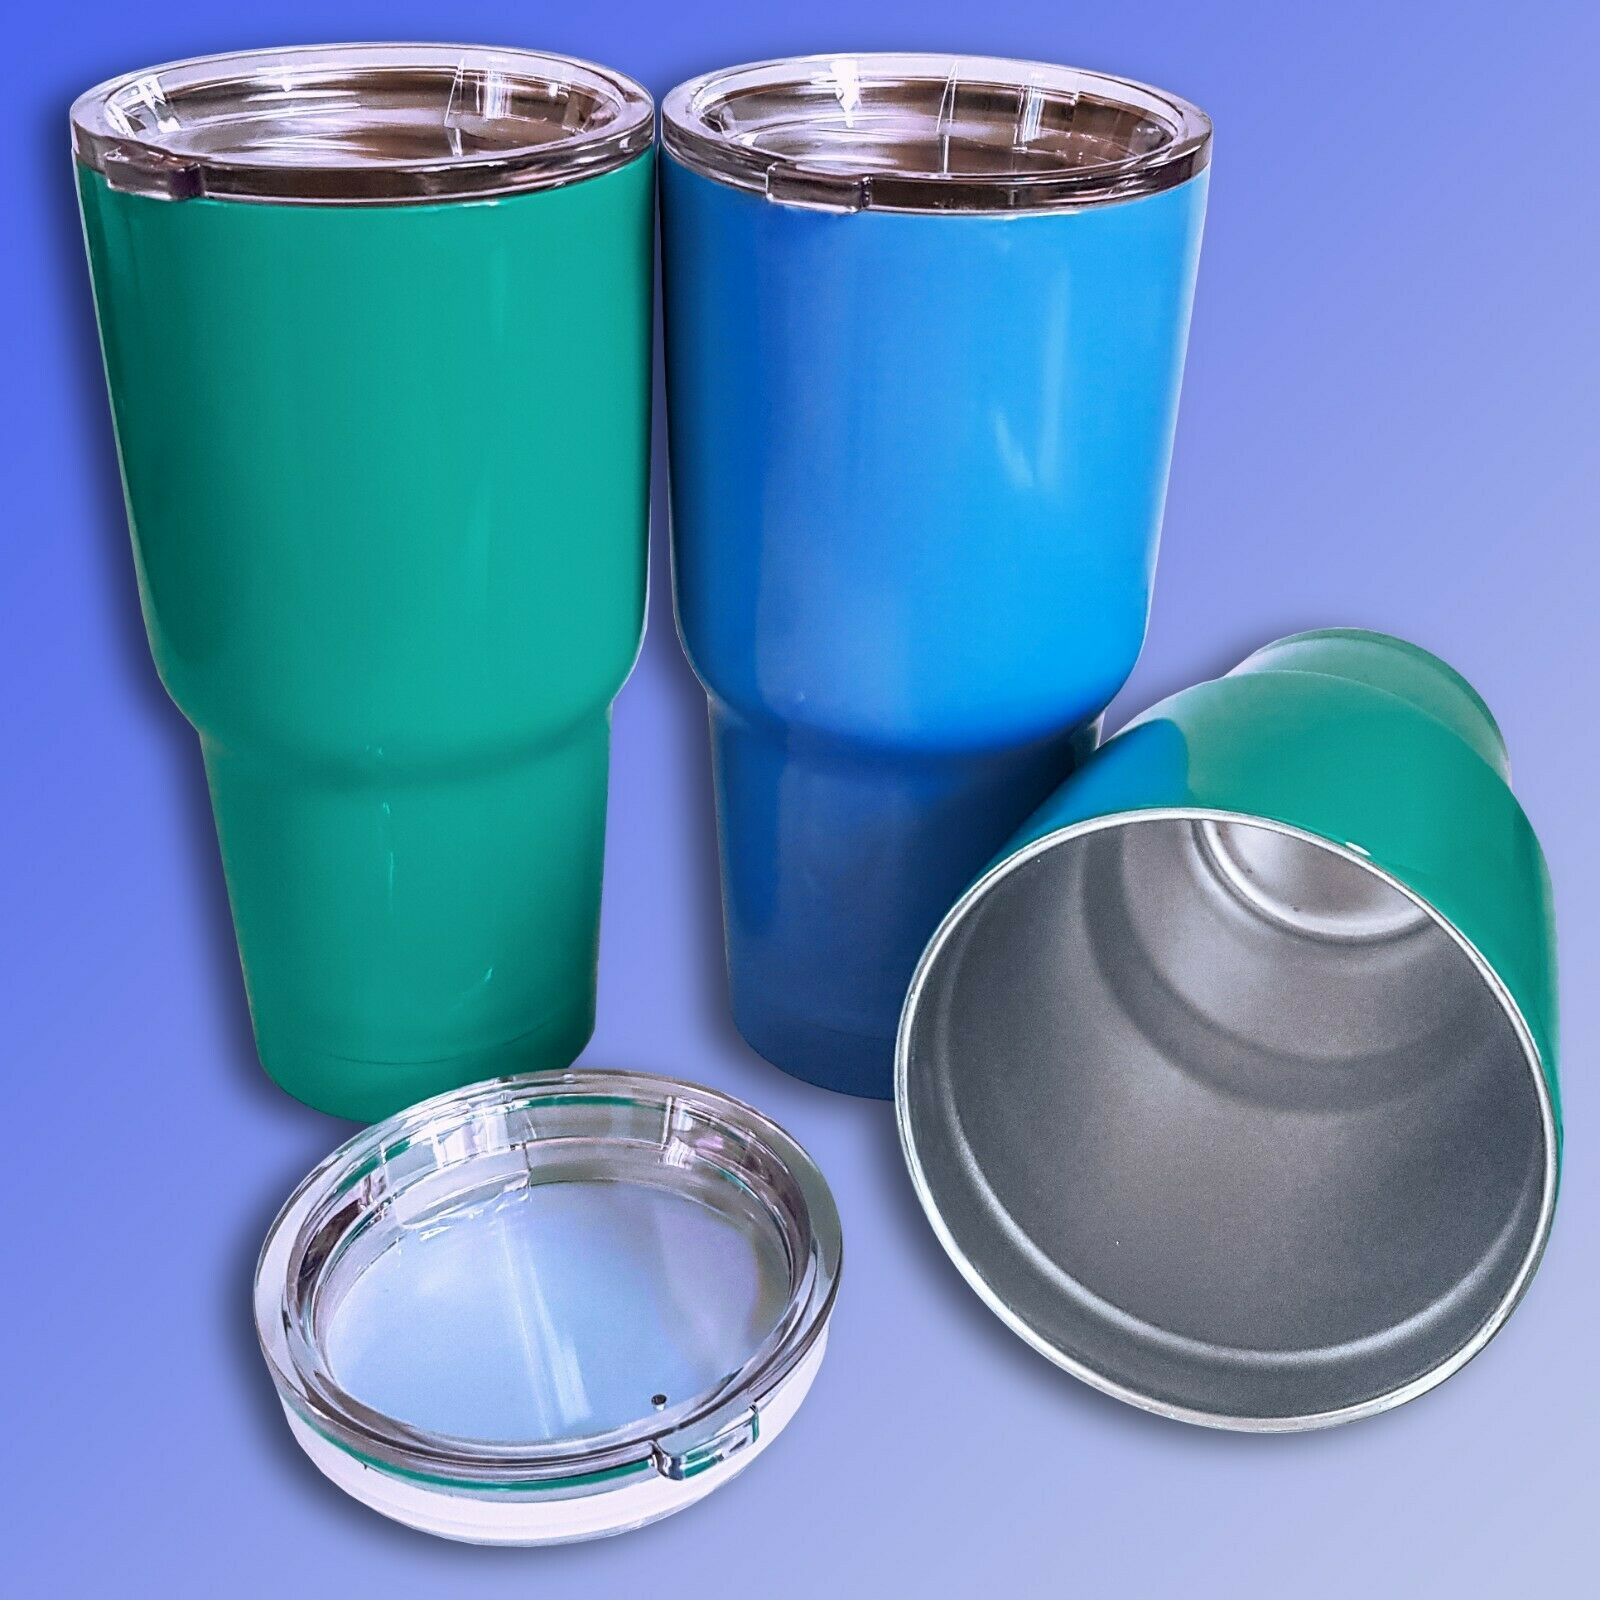 Stelton To Go Click Thermo Mug Coffee Mug Cup Dark Brown Metallic 340ml 580-17